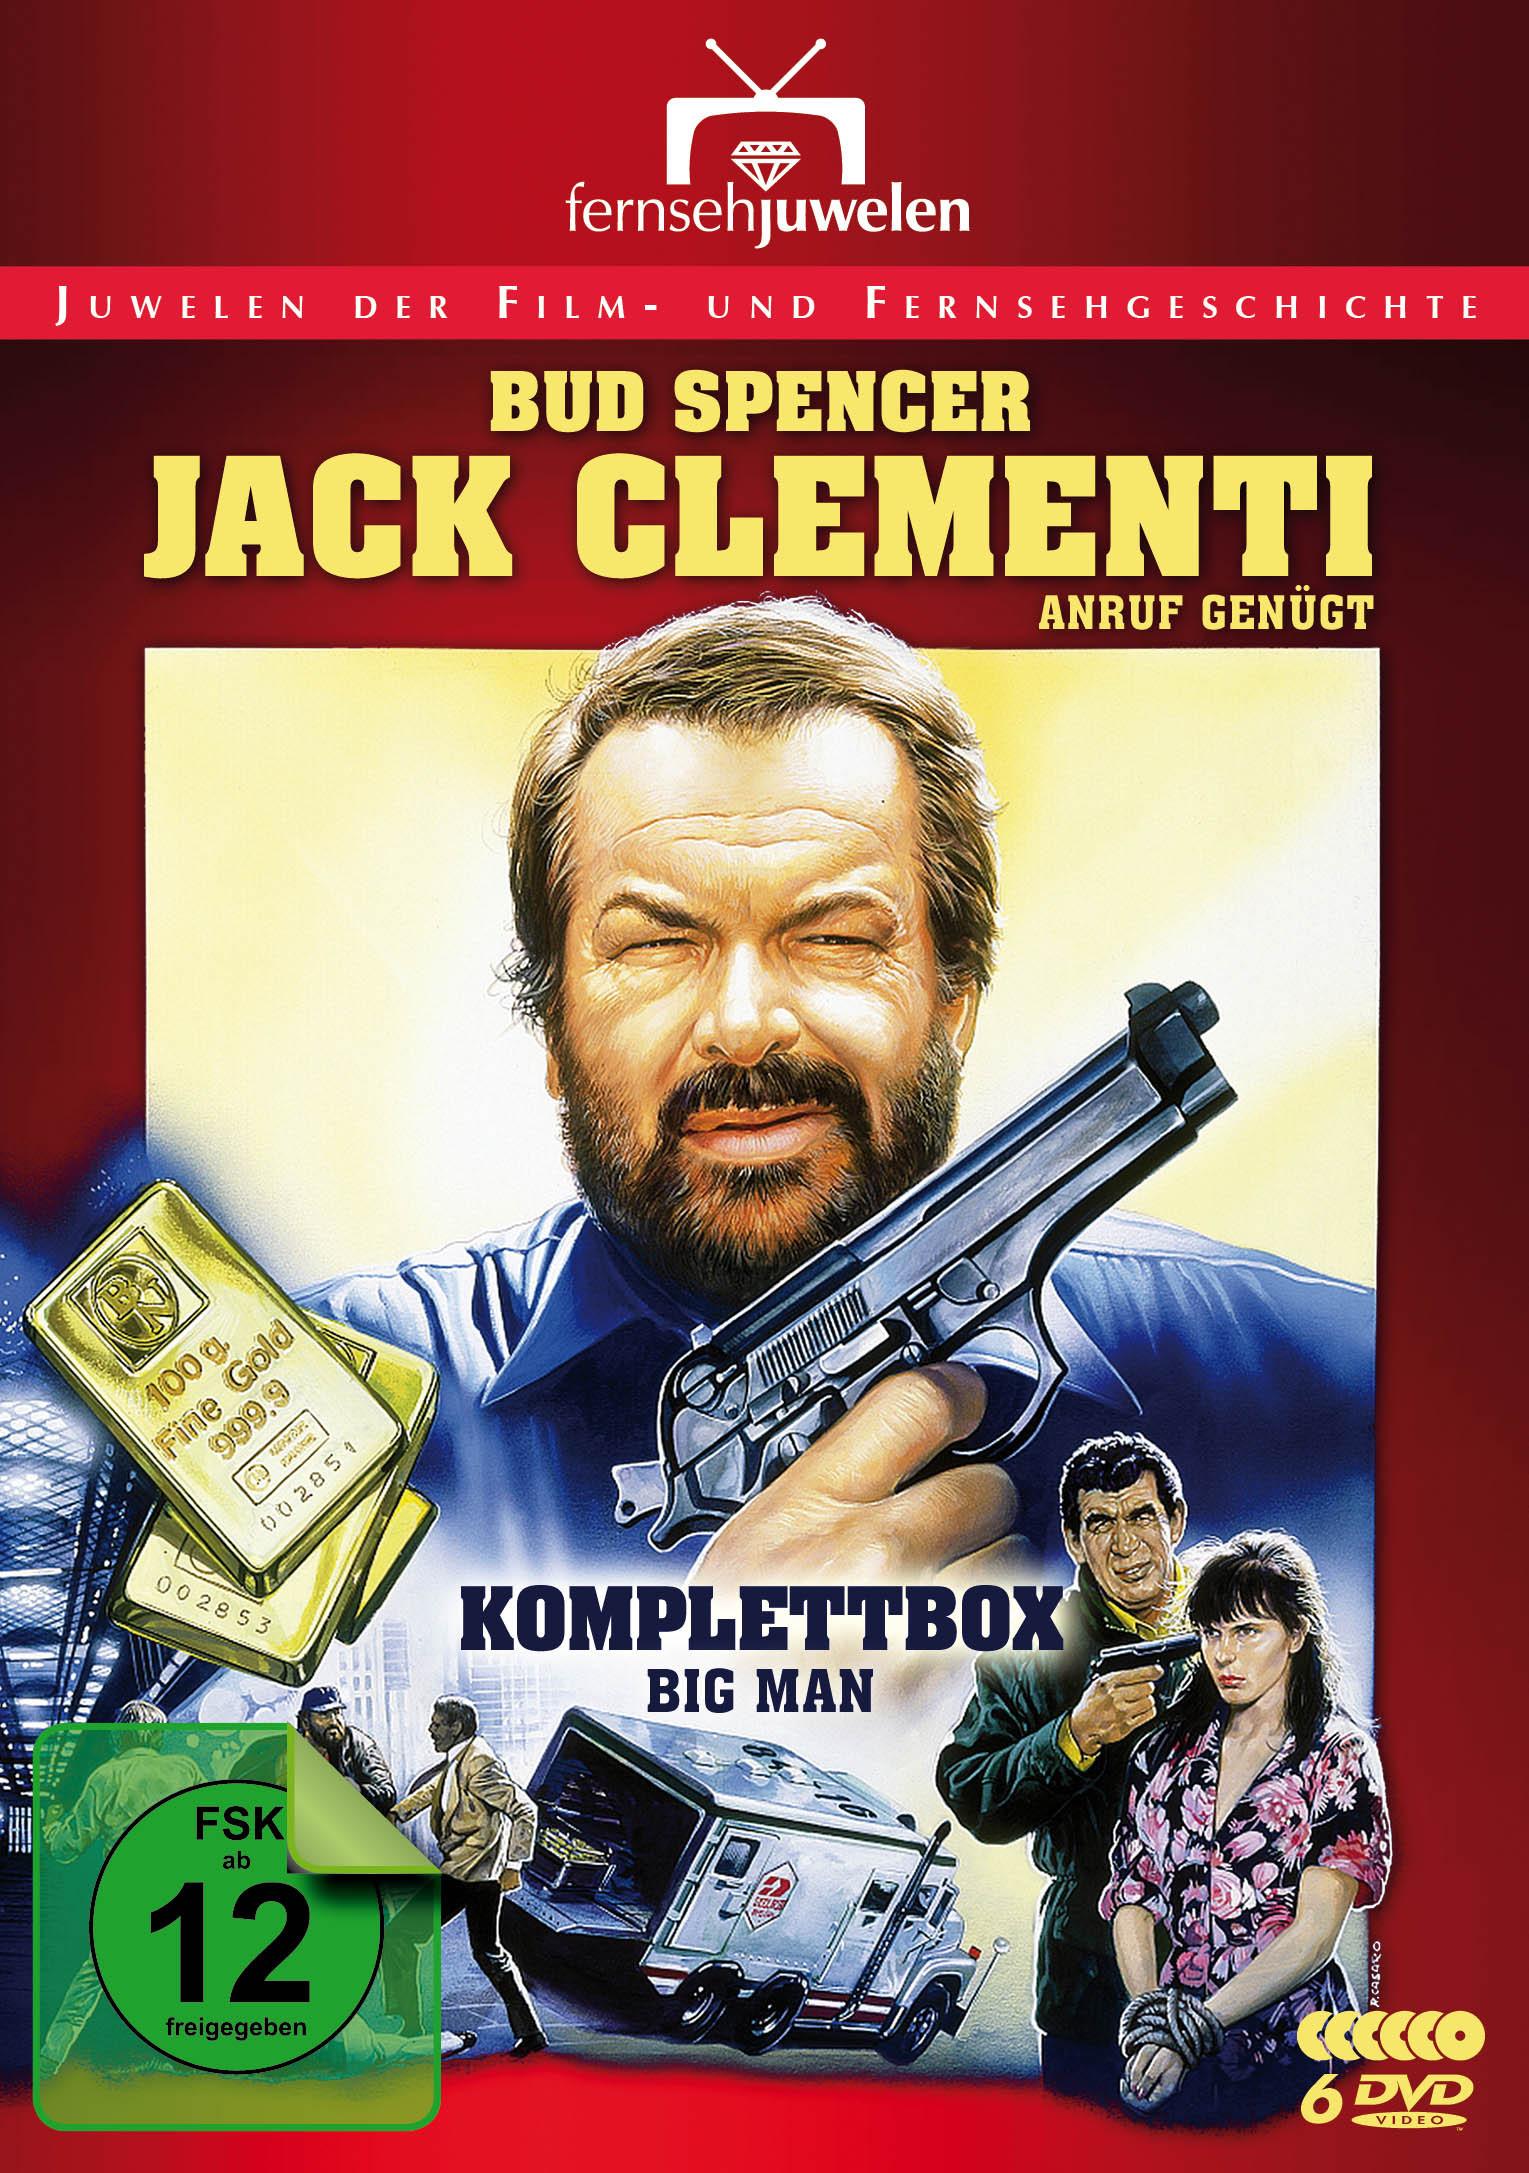 Bud Spencer: Jack Clementi, Anruf genügt Komplettbox